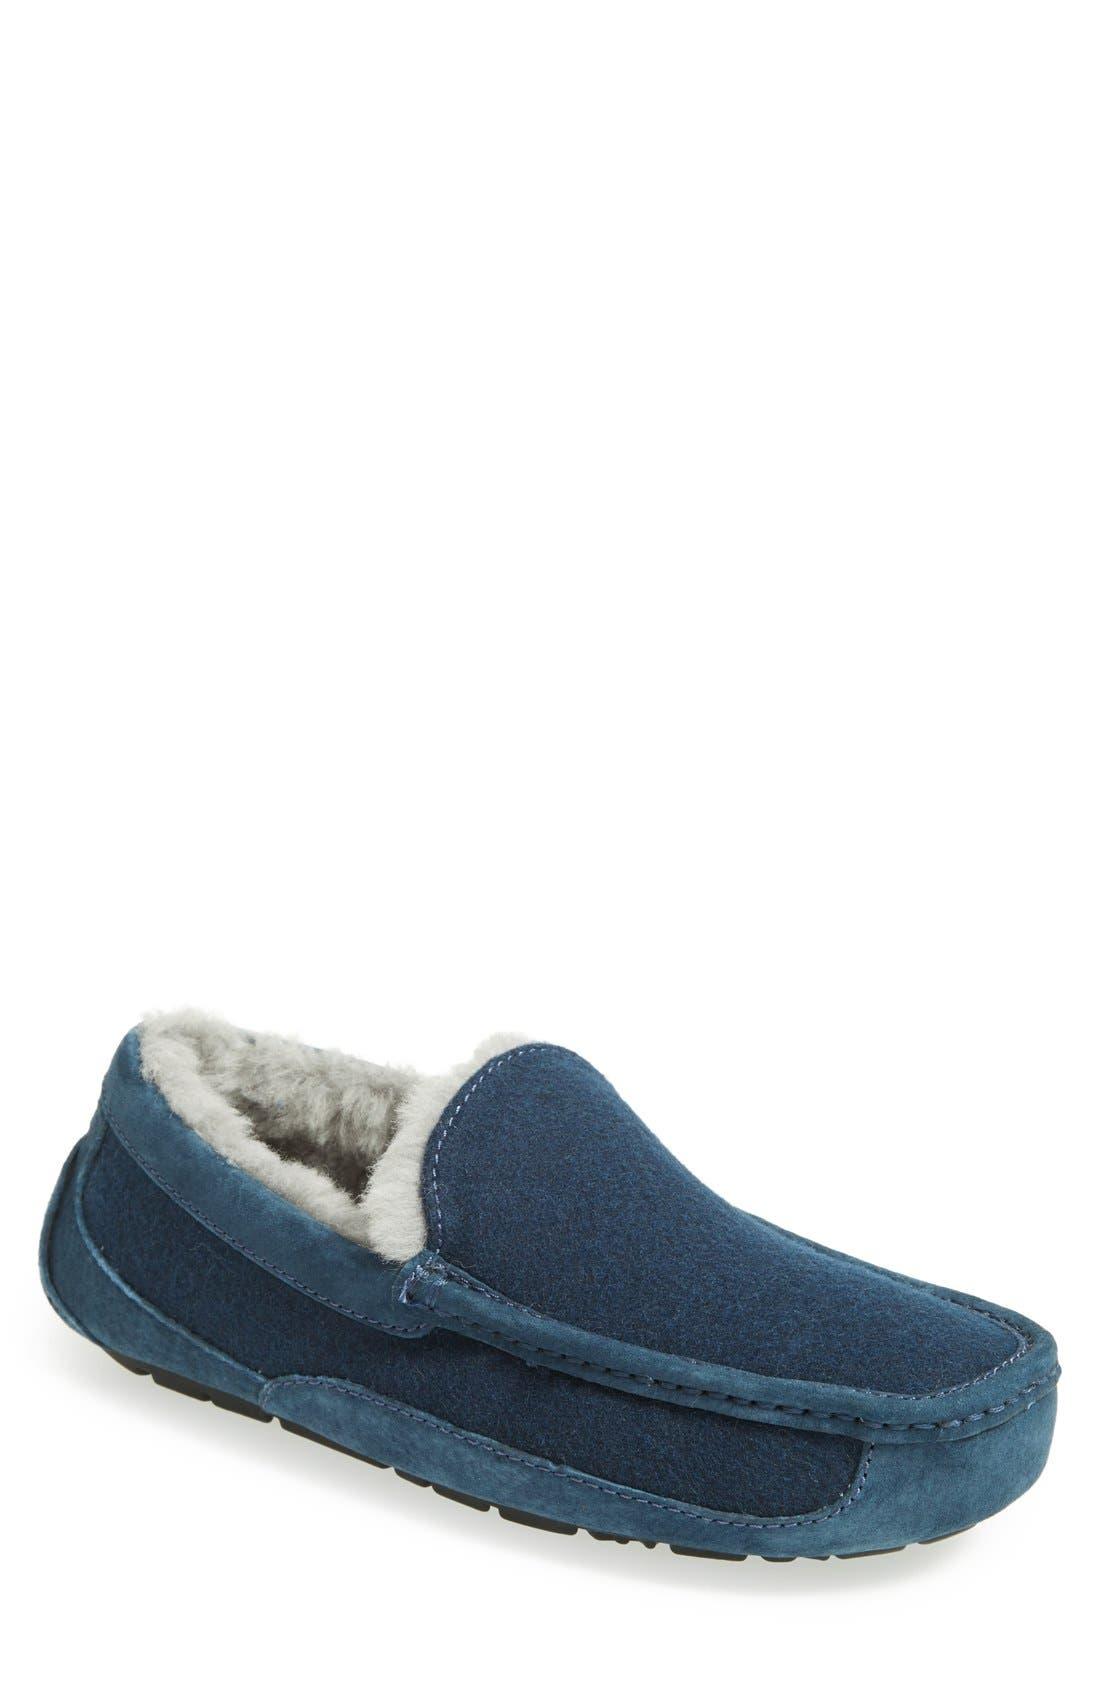 Main Image - UGG® Australia 'Ascot' Wool Slipper